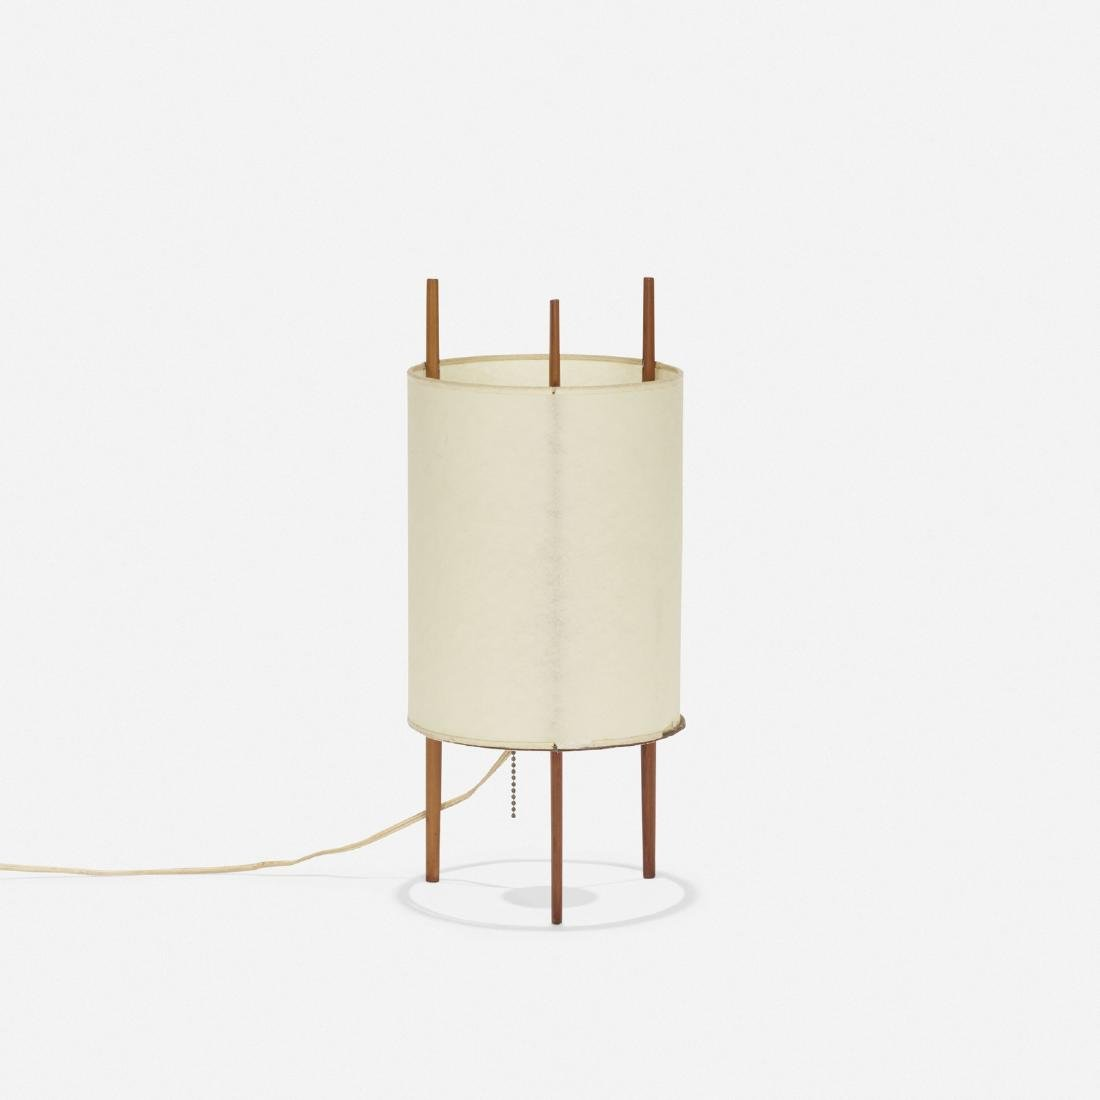 Isamu Noguchi, table lamp, model 9